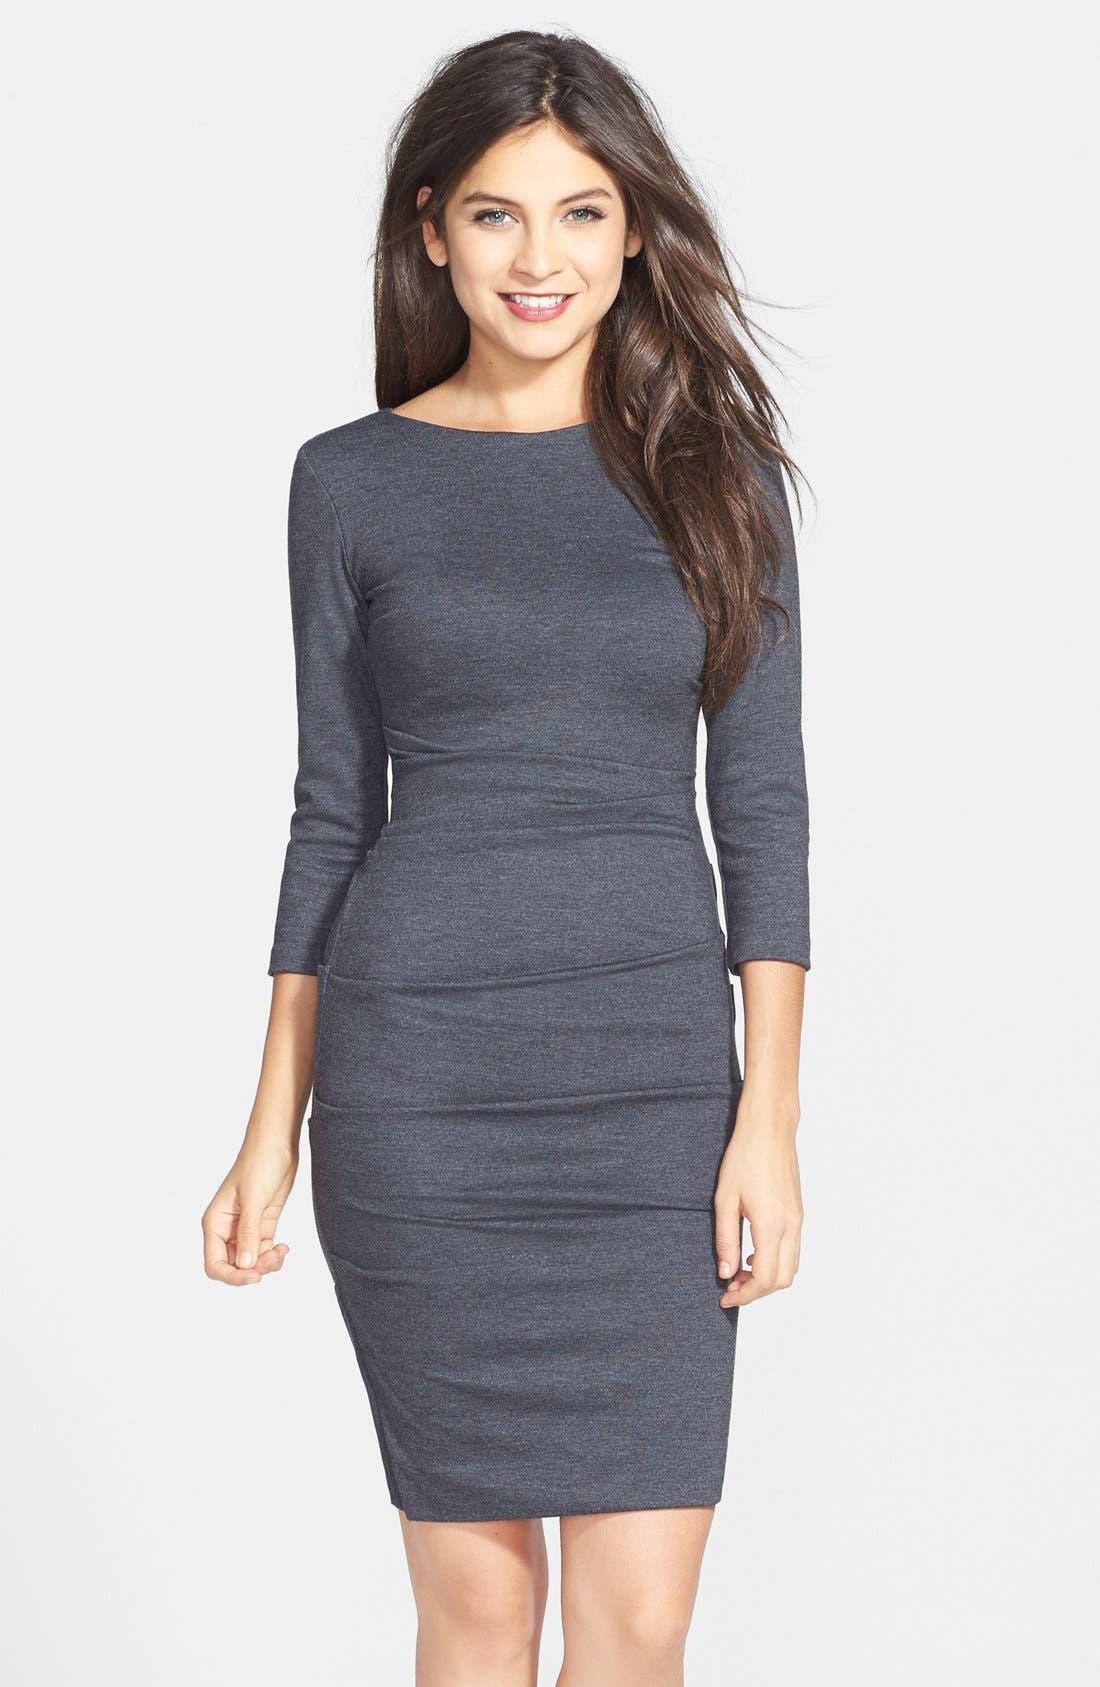 Alternate Image 1 Selected - Nicole Miller Ruched Ponte Knit Sheath Dress